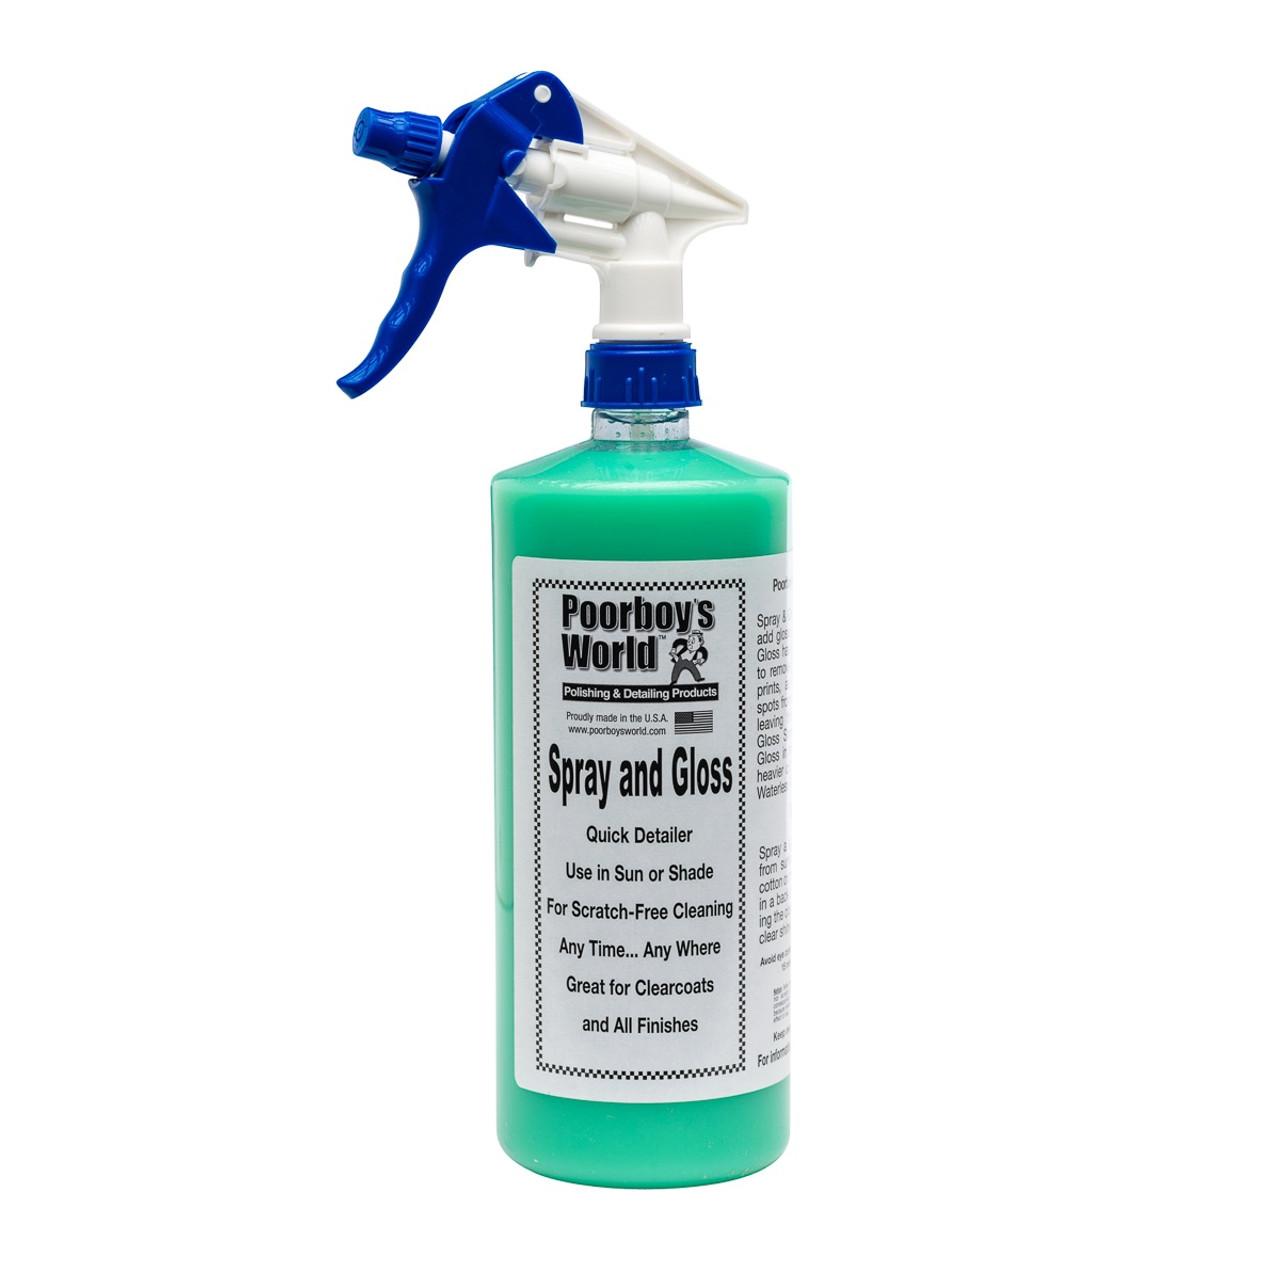 Poorboy's World Spray and Gloss 32oz w/Sprayer